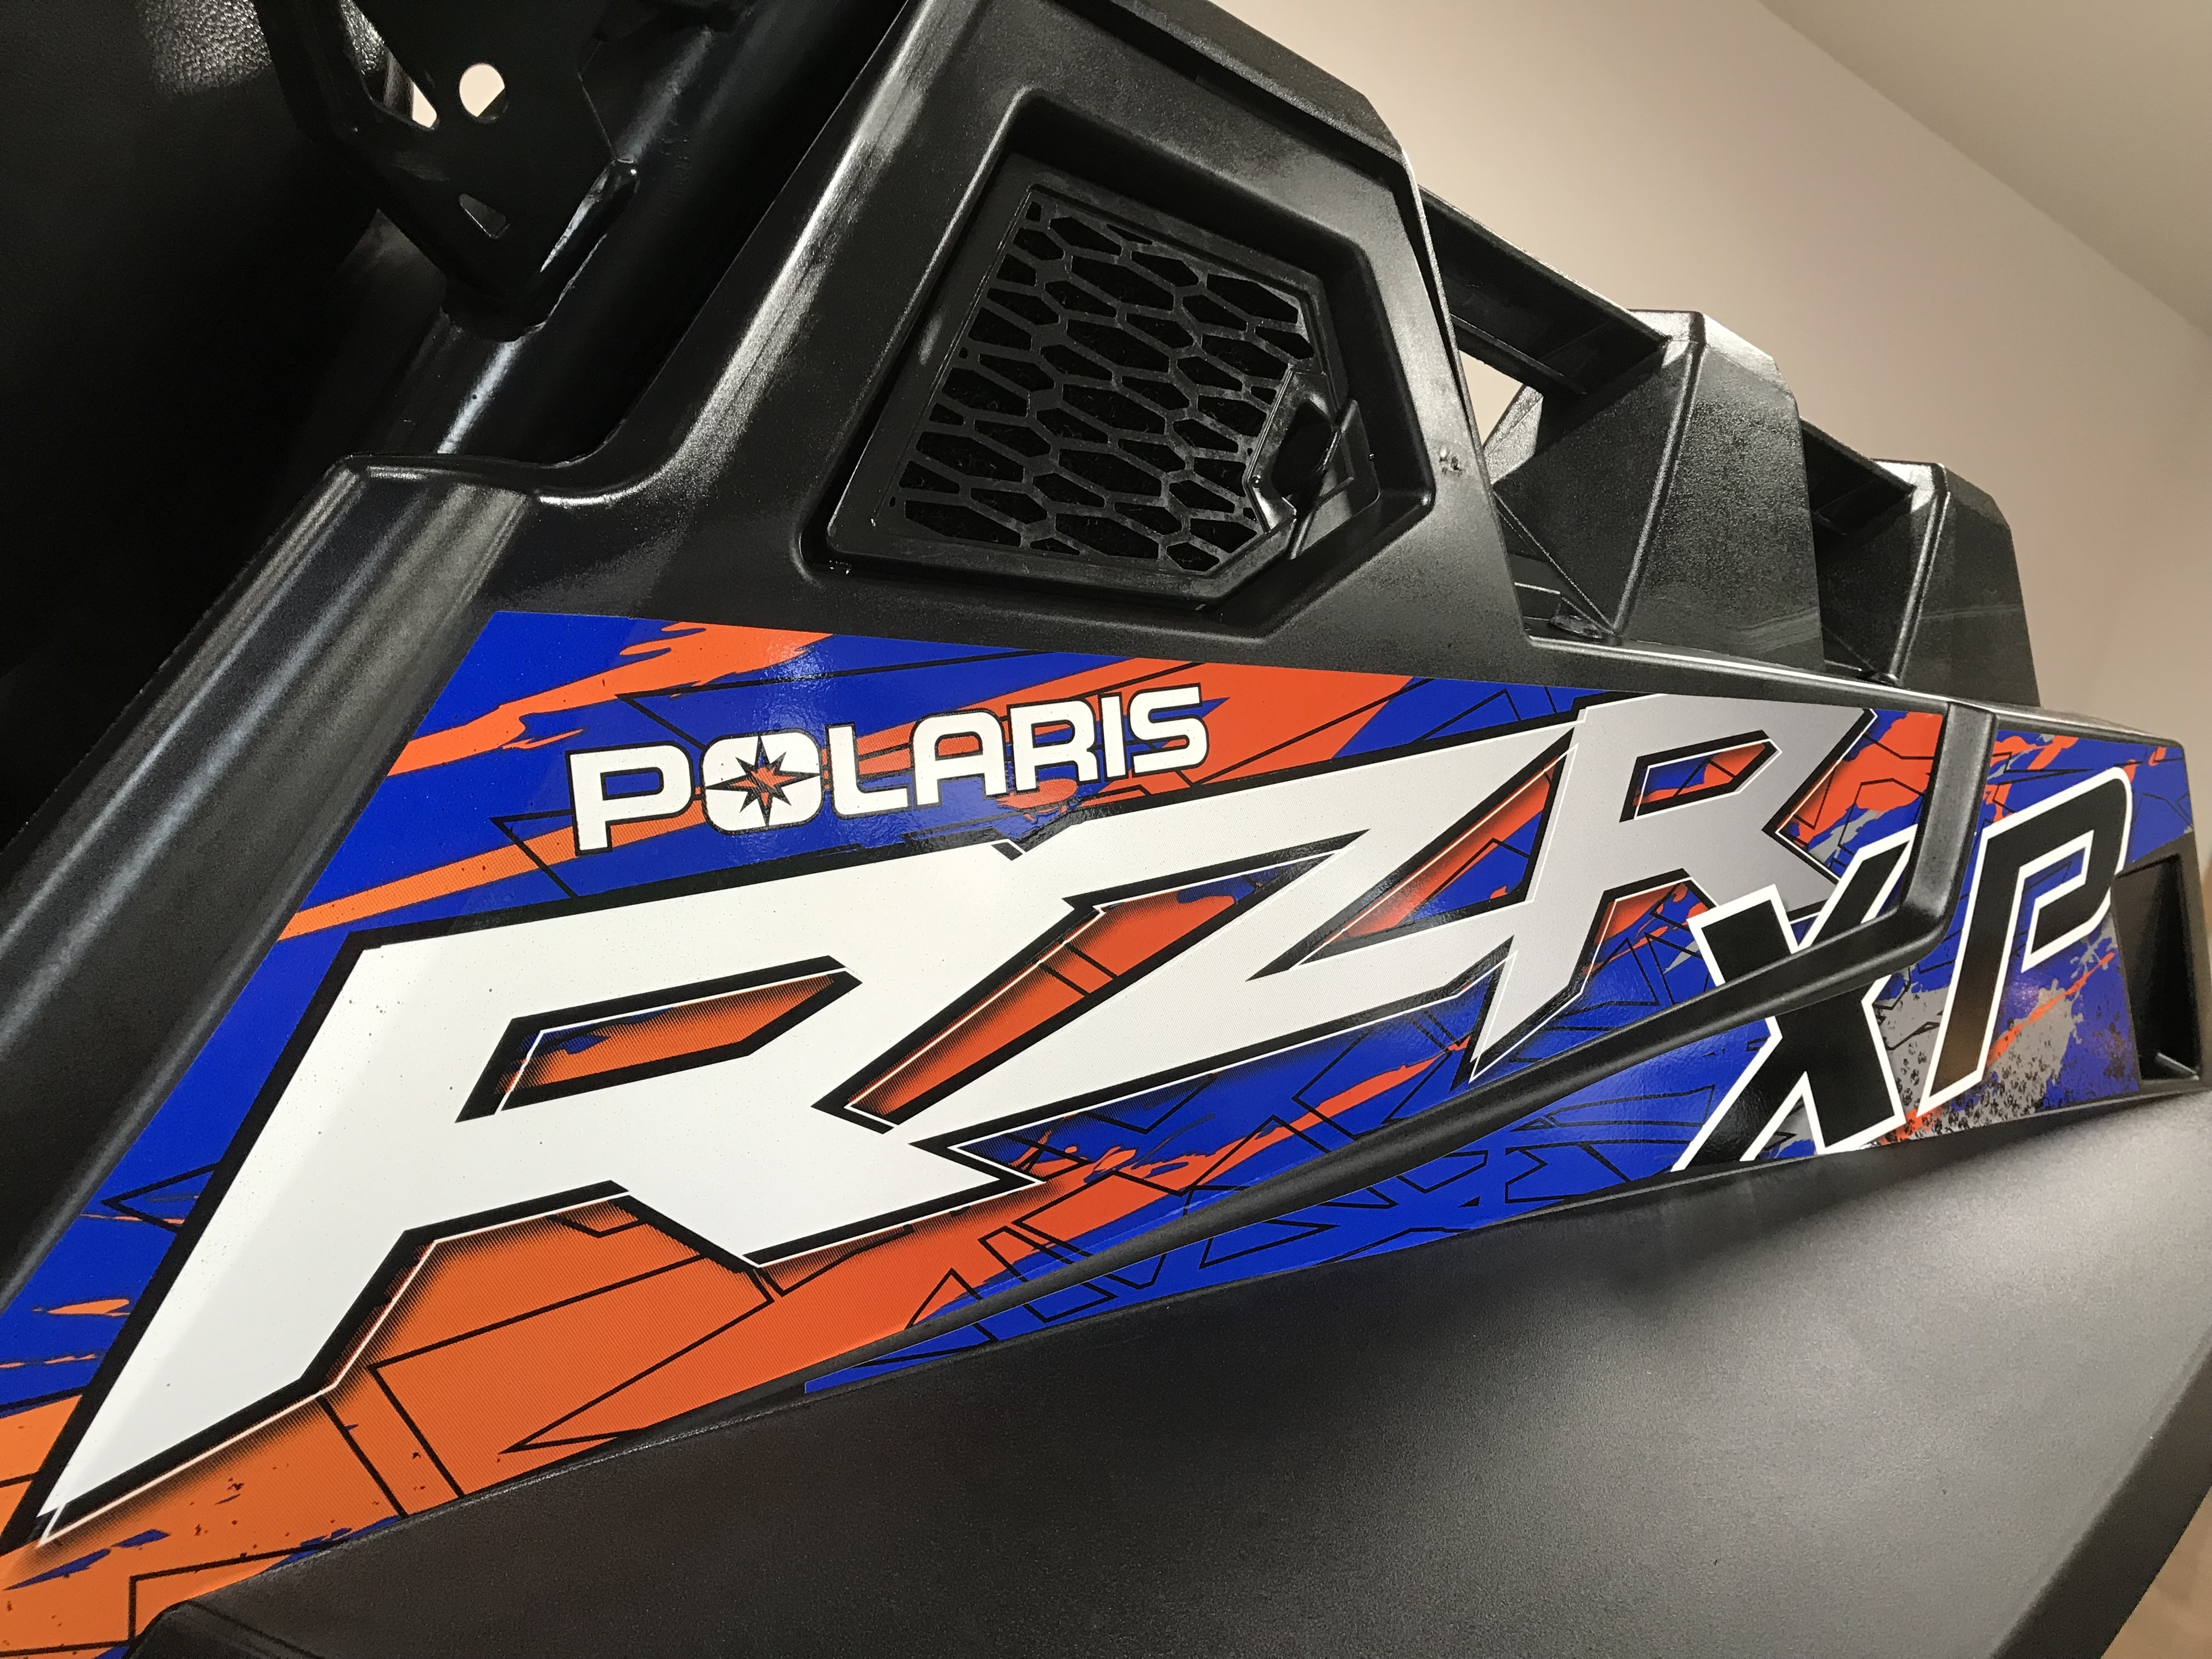 2013 Polaris RZR XP 900 EPS Limited Edition